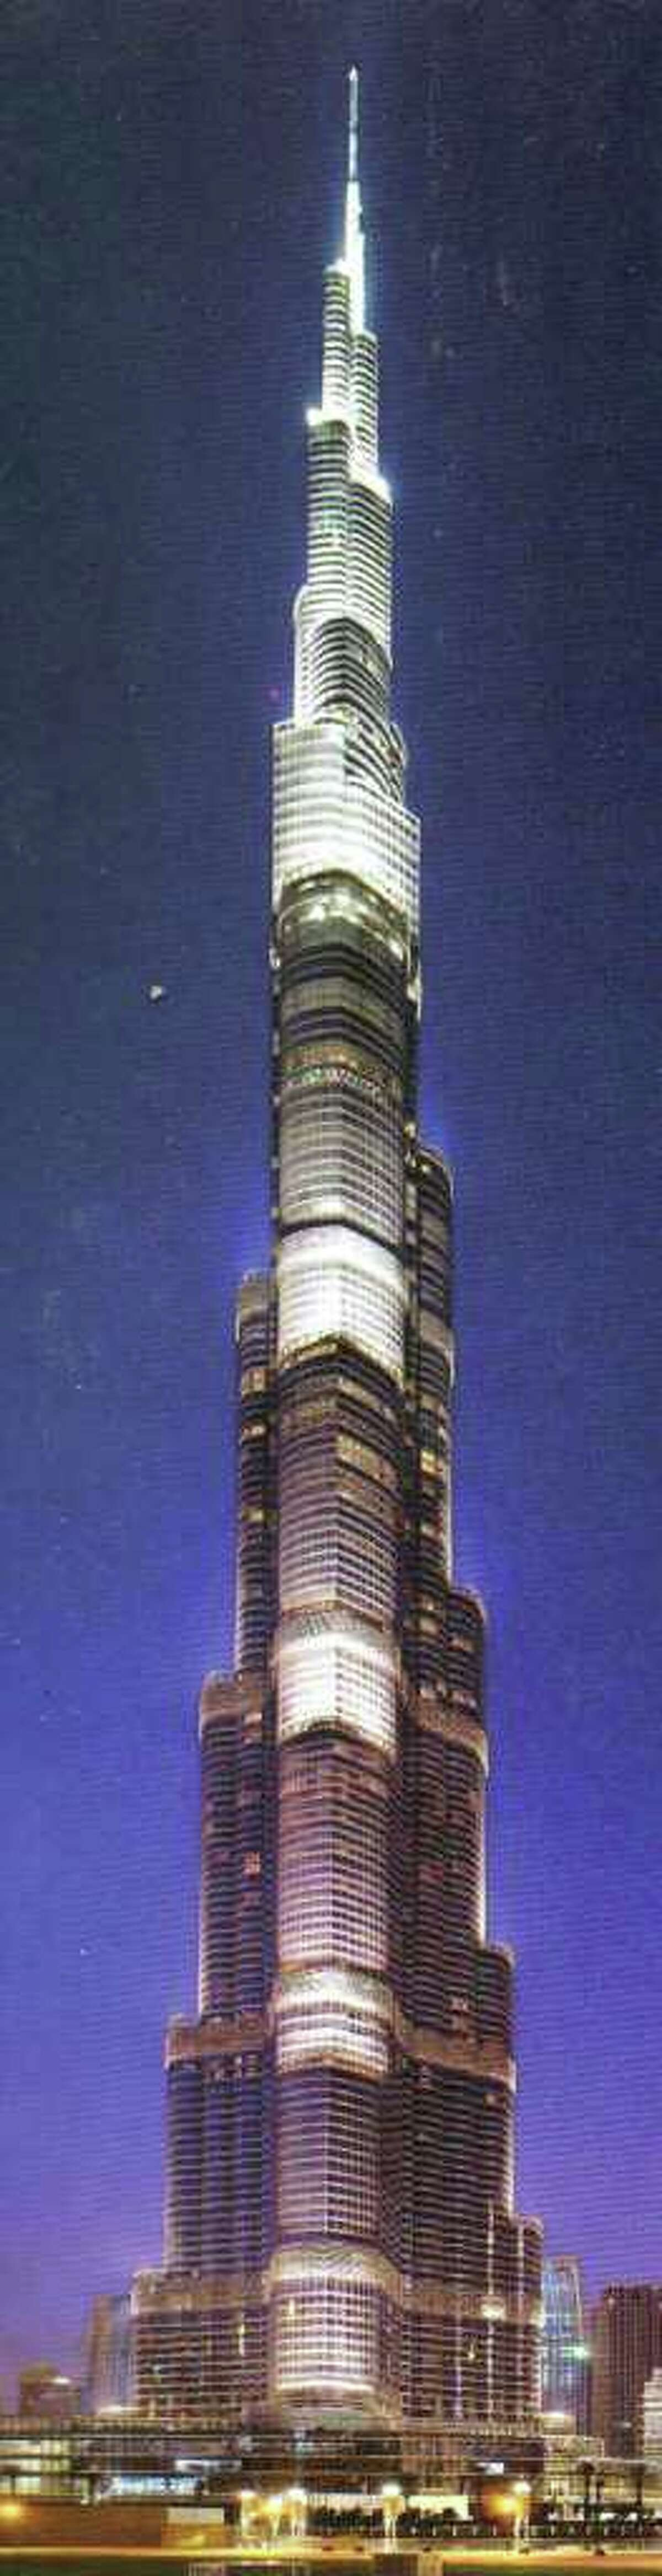 Standing 2,716.5 feet tall, reaching 160 floors into the sky, the Burj Khalifa in Dubai is, says Anne Semmes, a shimmering gem in the Arabian desert